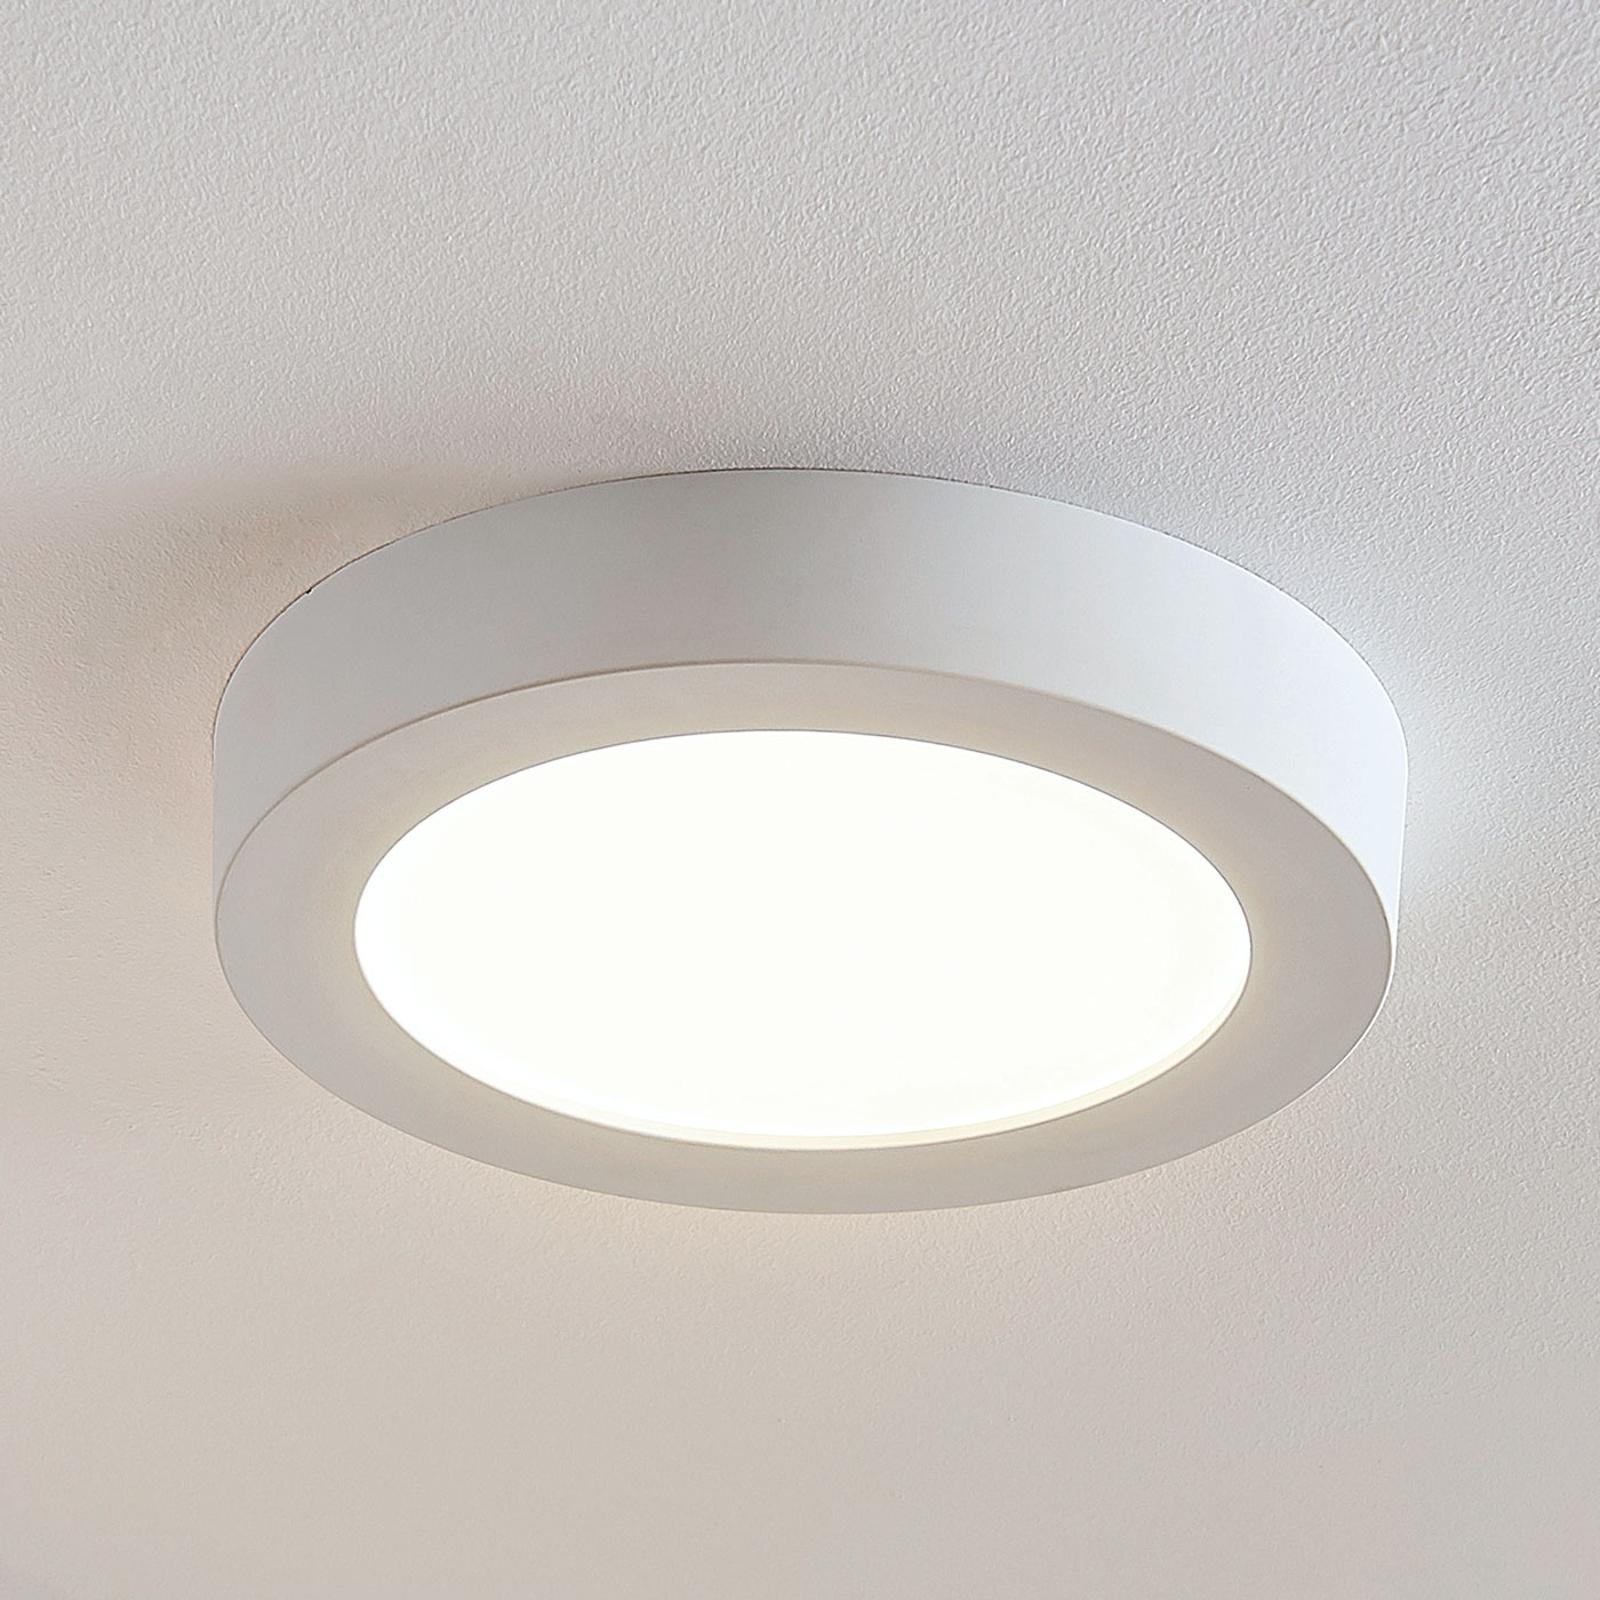 Plafón LED Marlo blanco 3000K redonda 25,2 cm